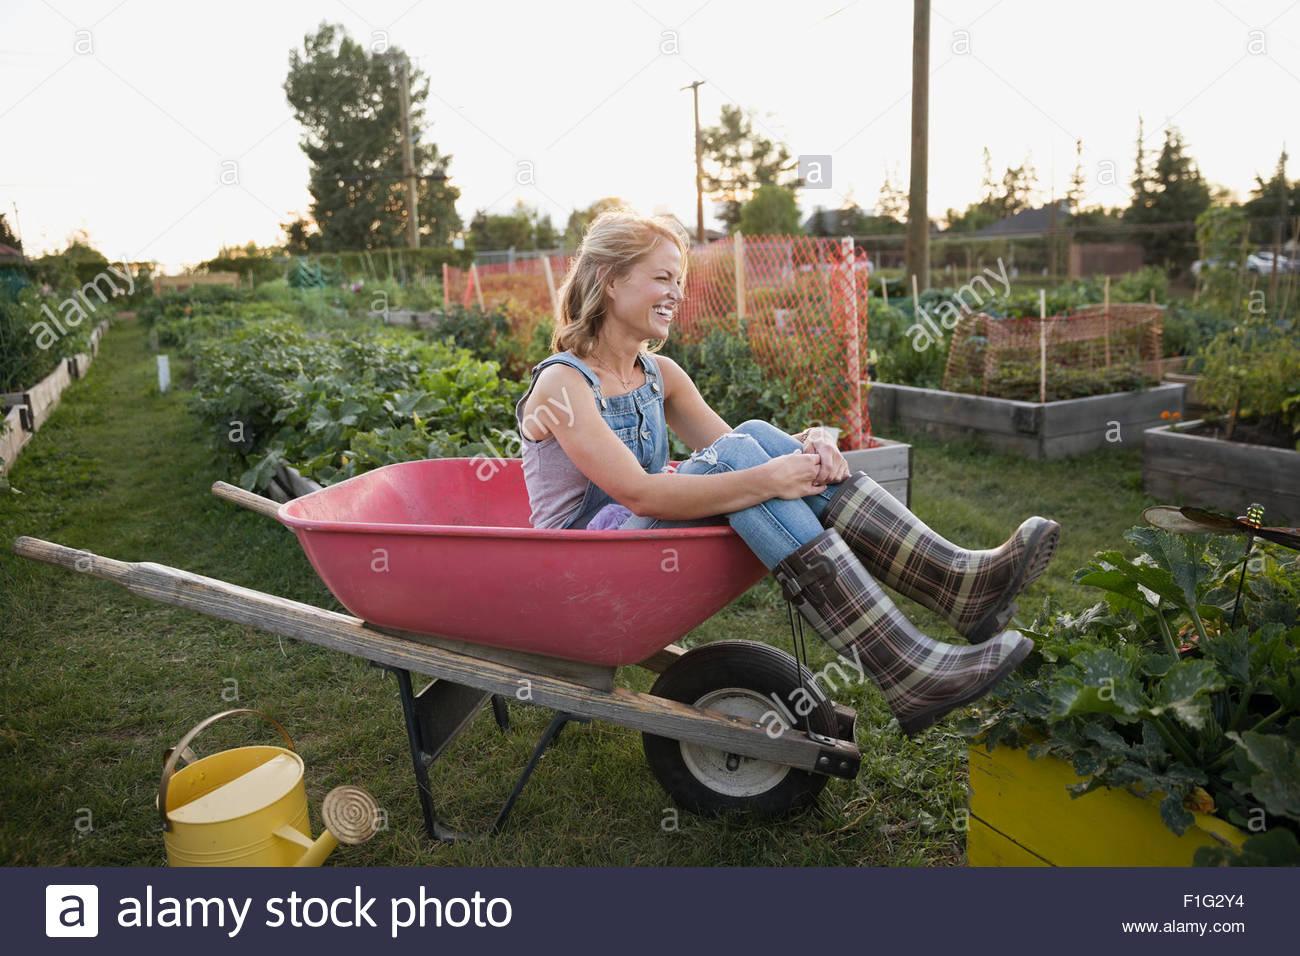 Donna sorridente plaid wellingtons seduta carriola giardino Immagini Stock